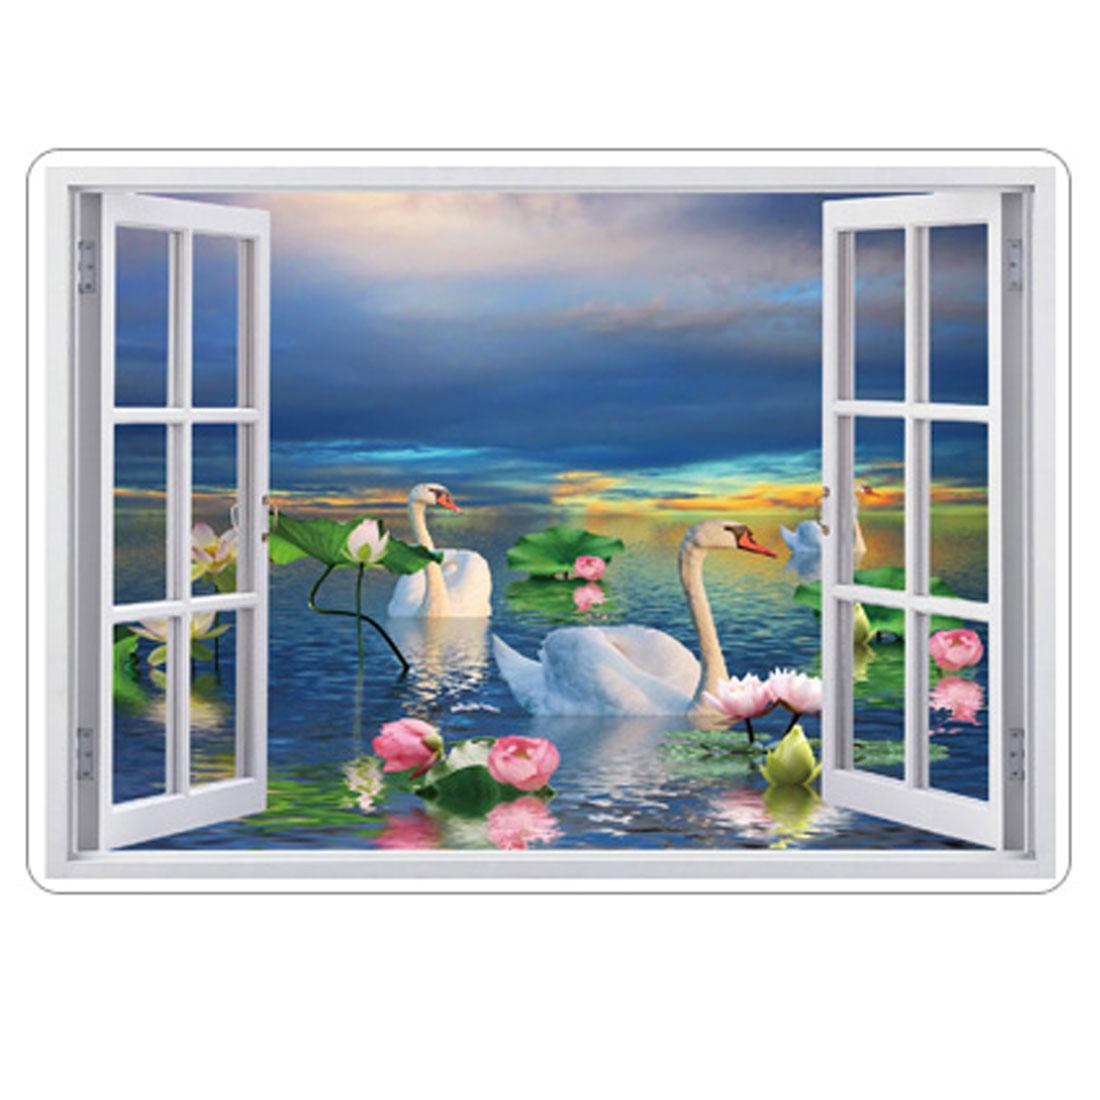 Household PVC Swan Pattern DIY Ornament Wall Sticker Decal Mural 50 x 70cm